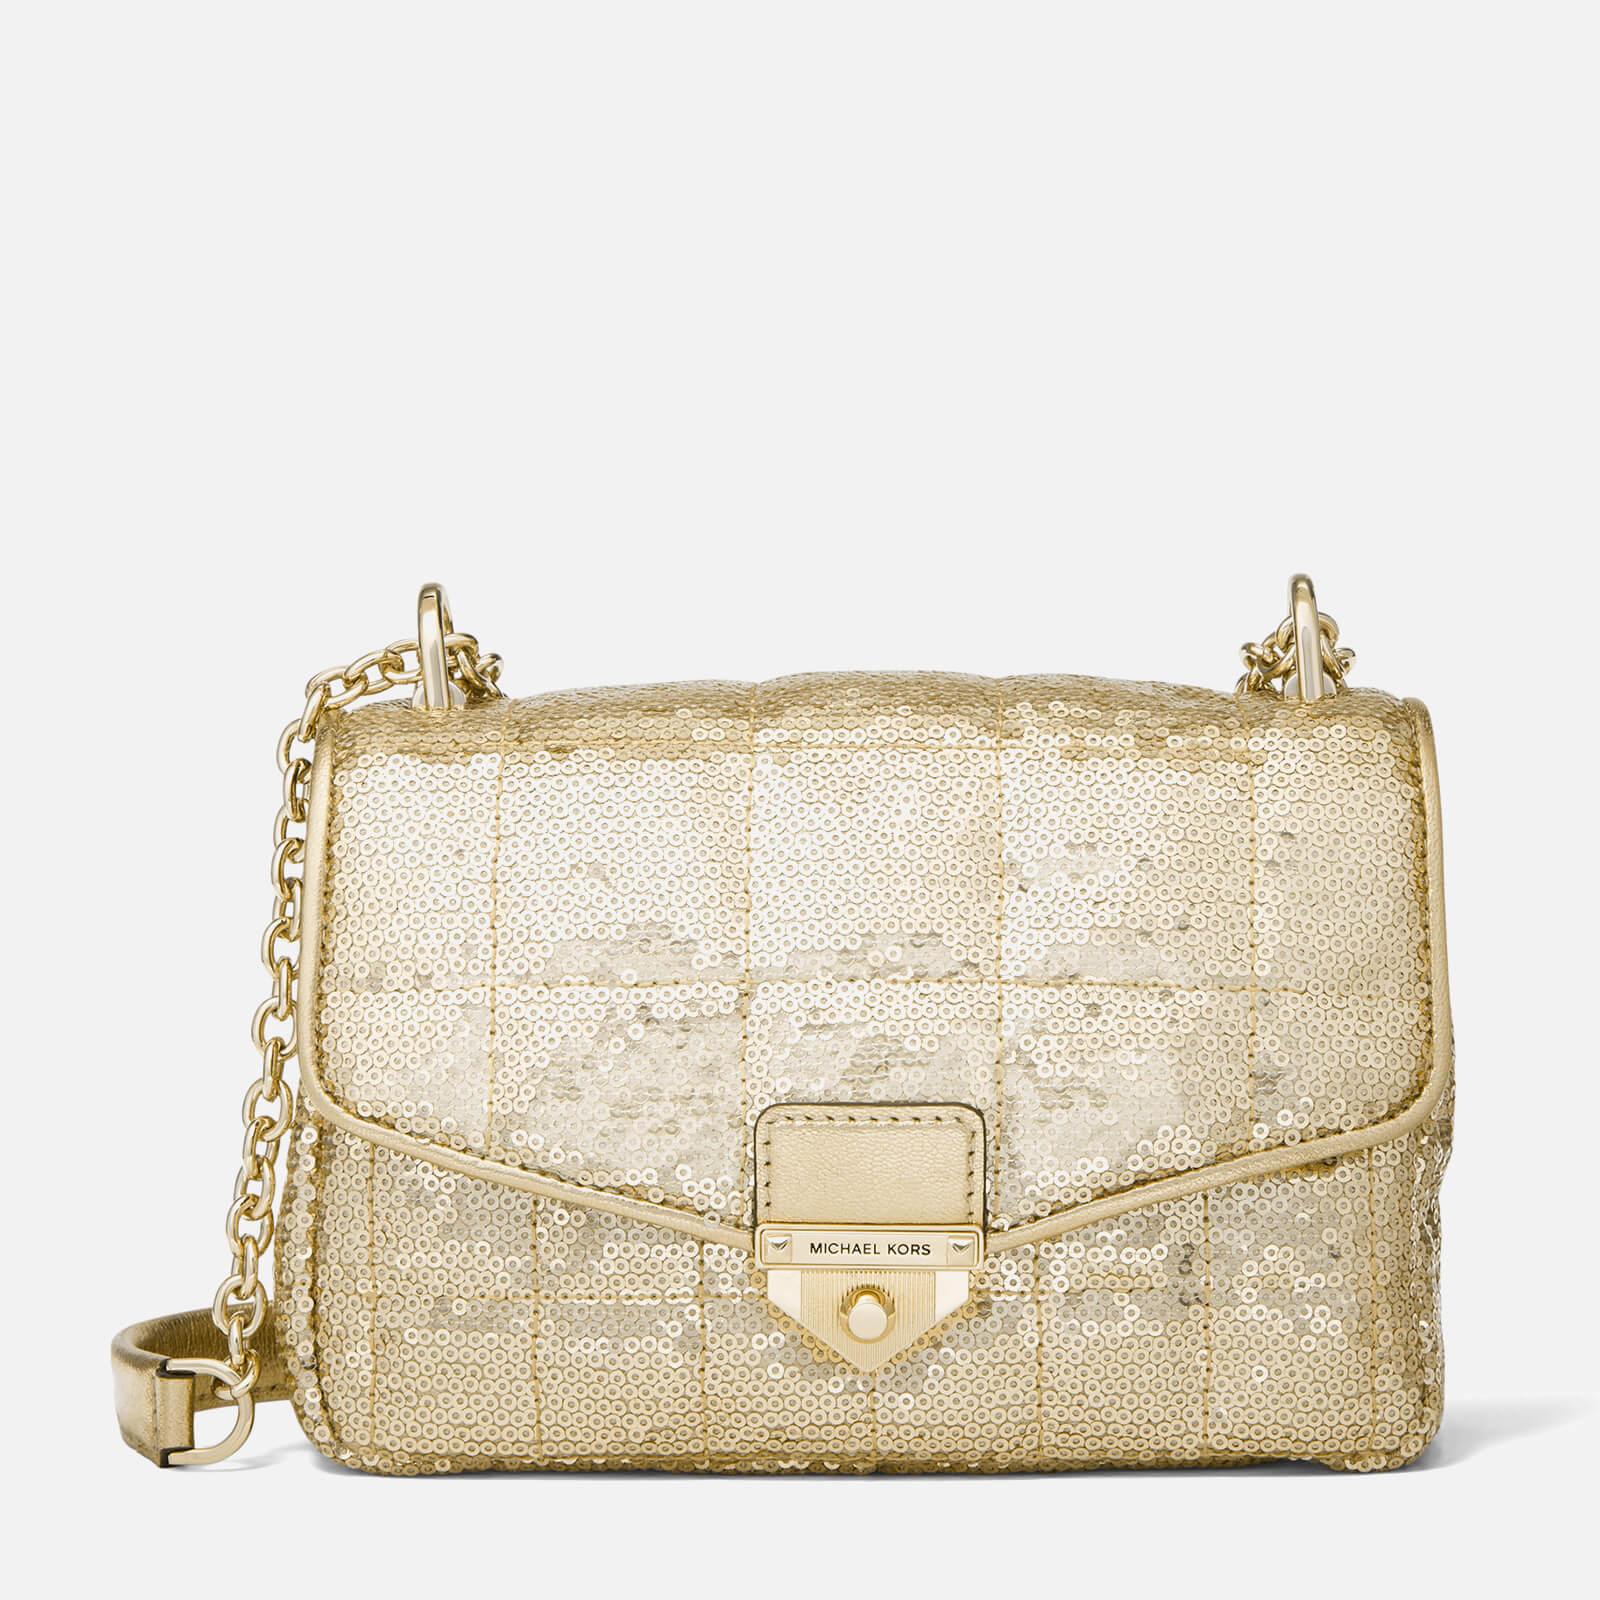 MICHAEL Michael Kors Women's Soho Small Chain Shoulder Bag - Pale Gold